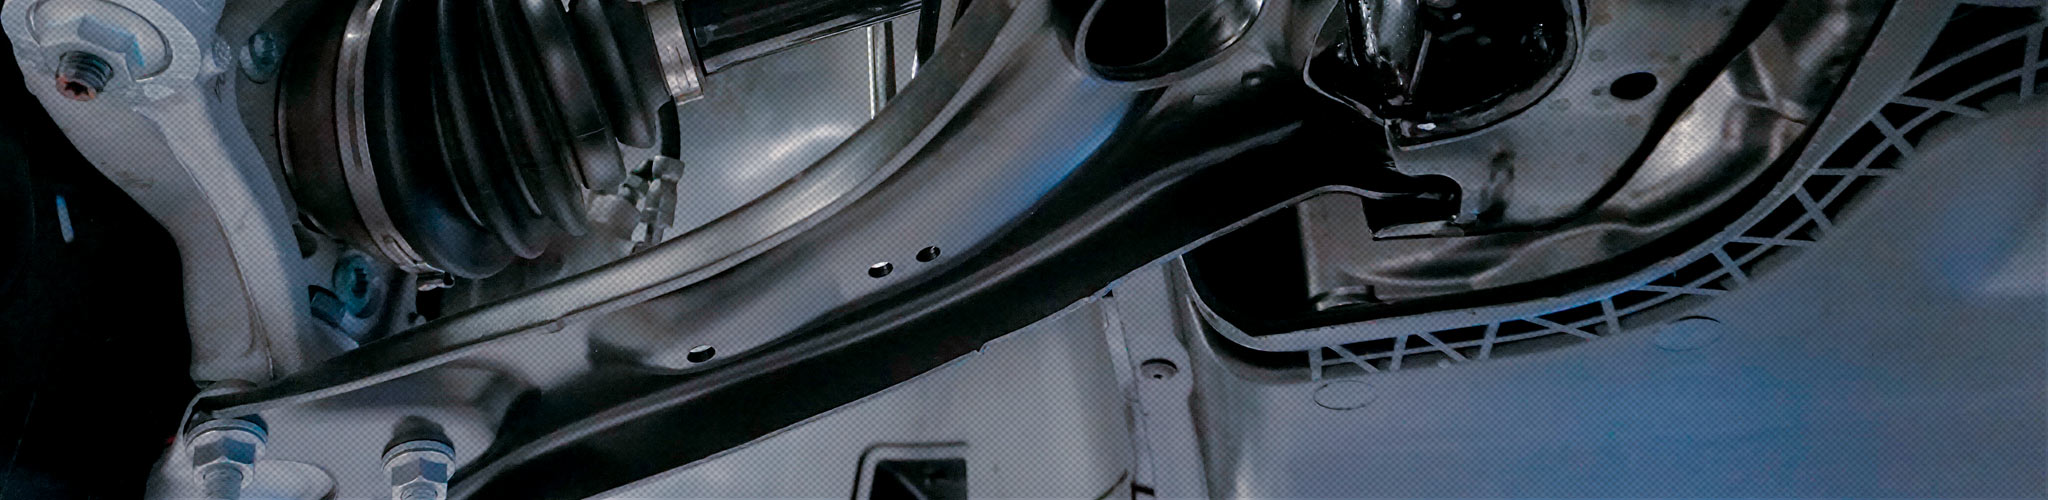 Pair Set Of 2 Rear Moog Susp Trailing Arms R-Series For Concorde Interpid Vision